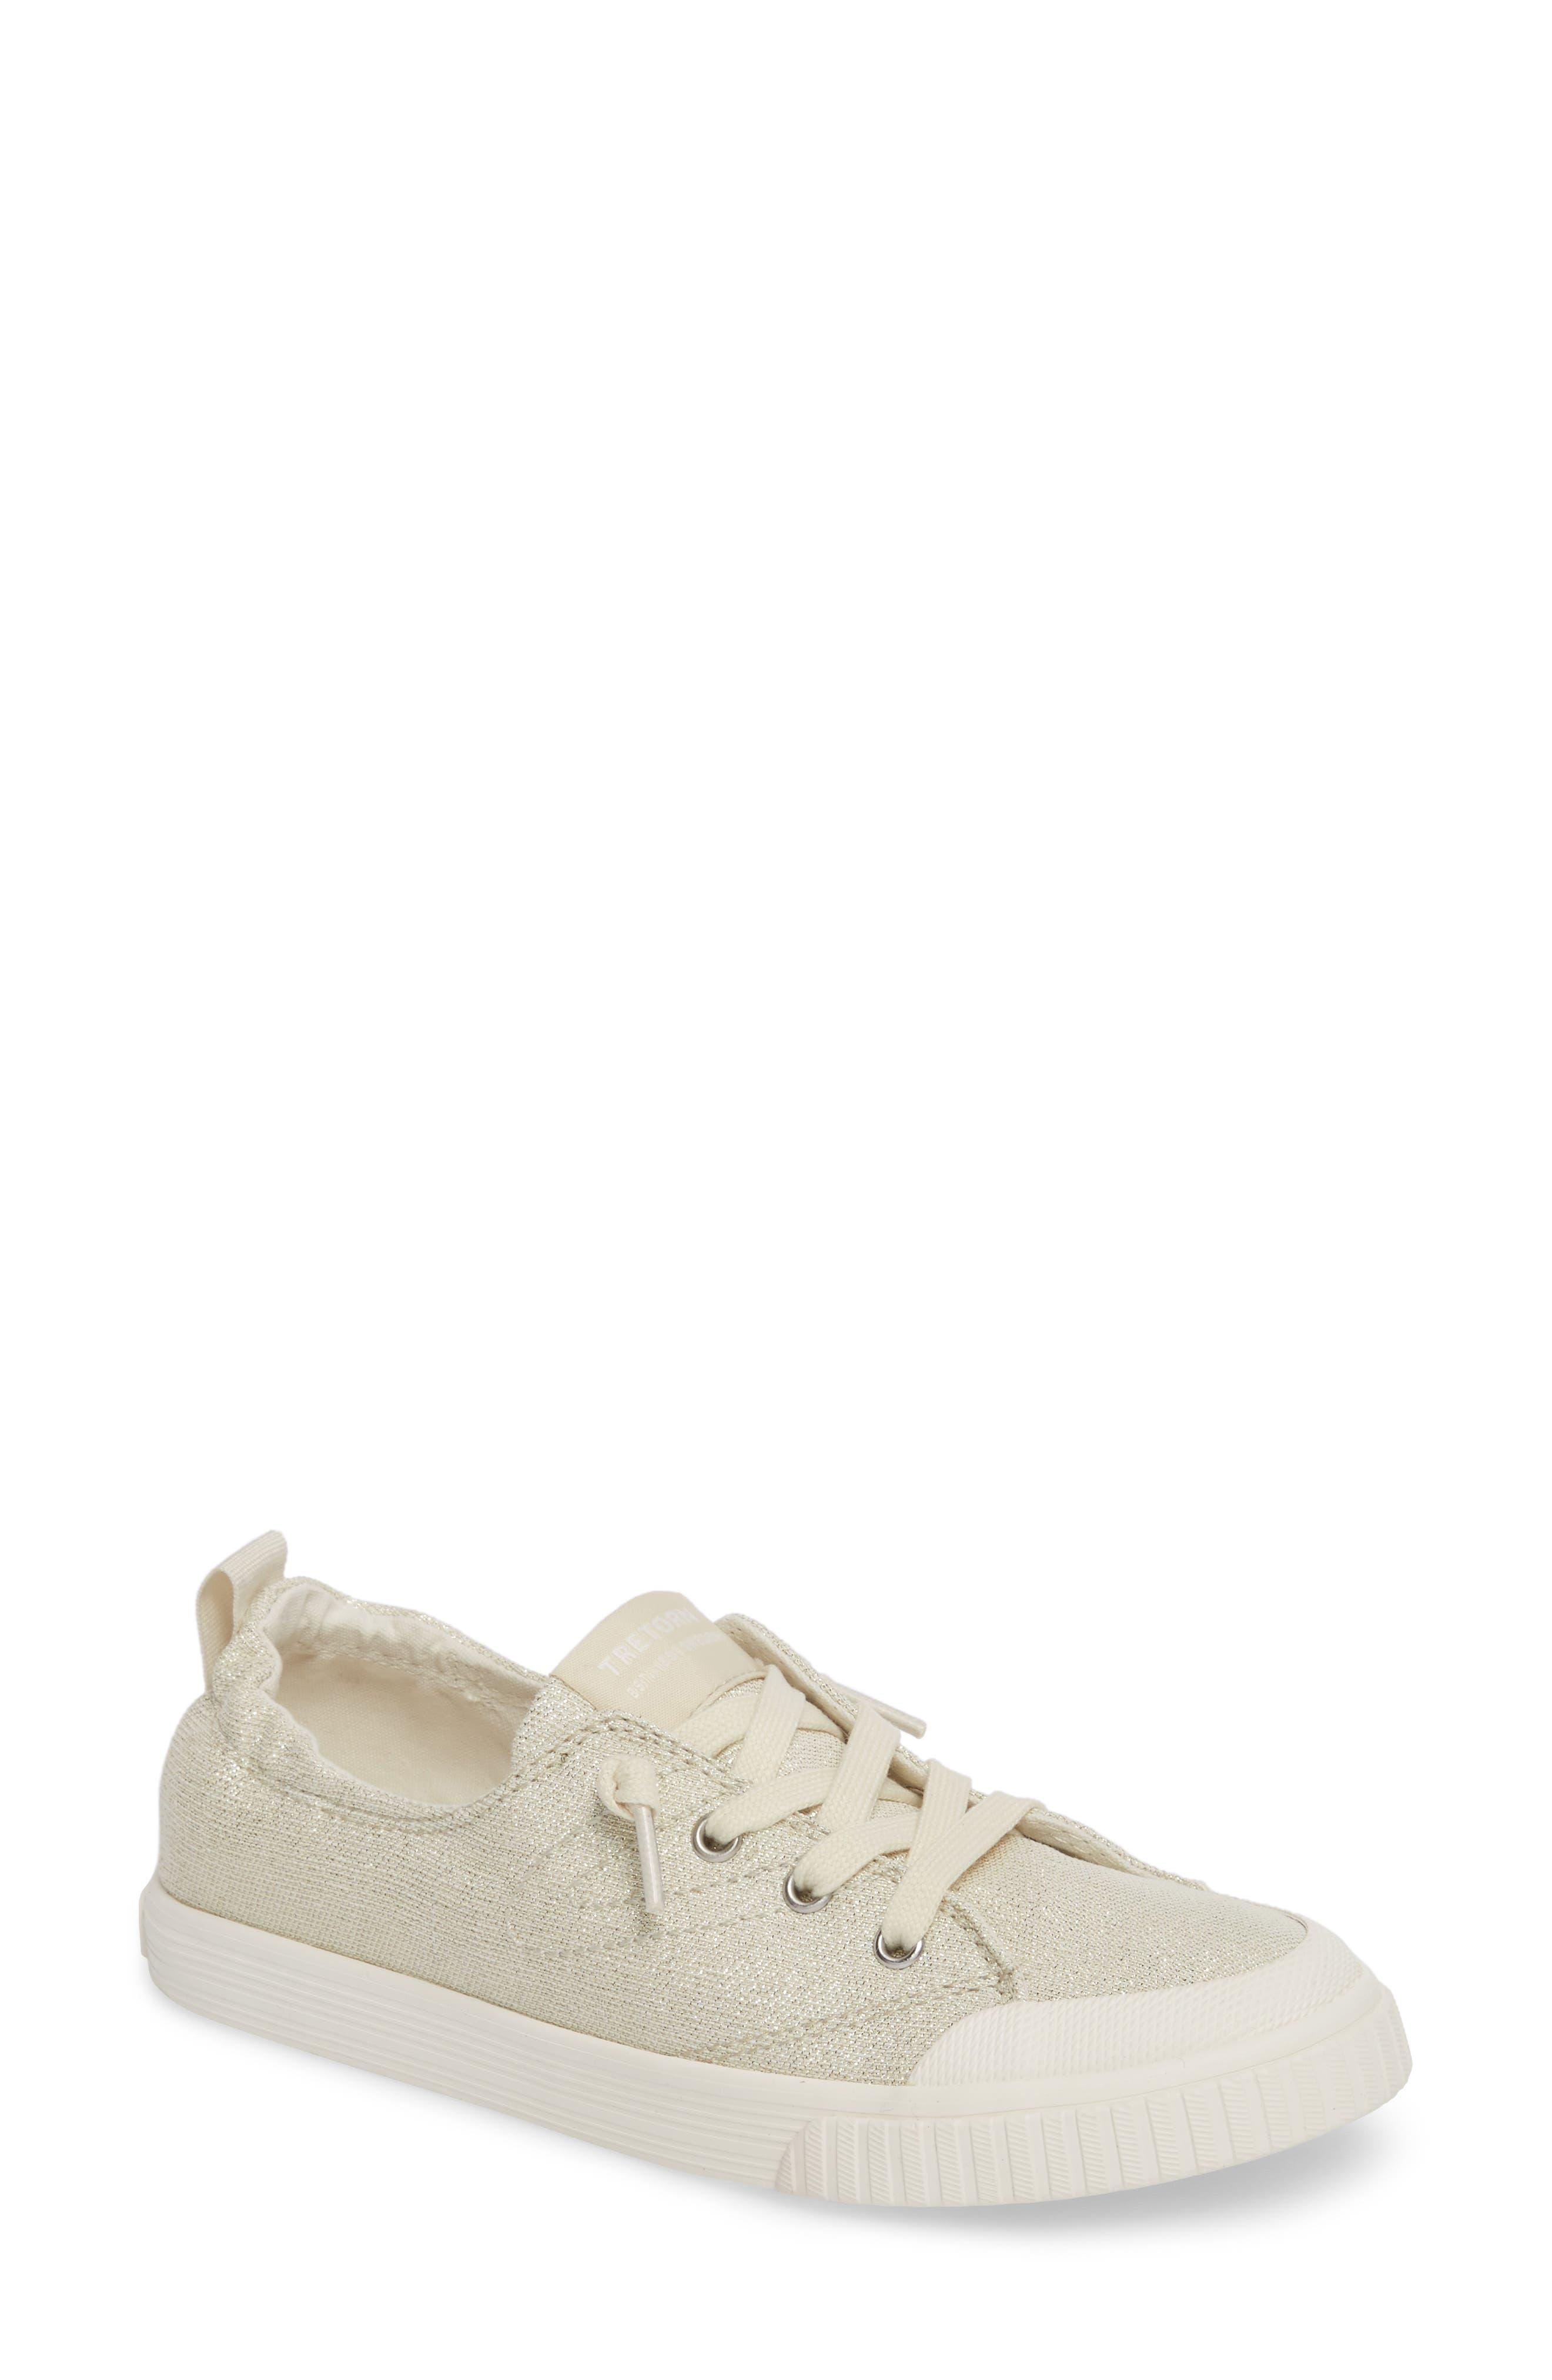 Meg Slip-On Sneaker,                             Main thumbnail 1, color,                             Angora/ White